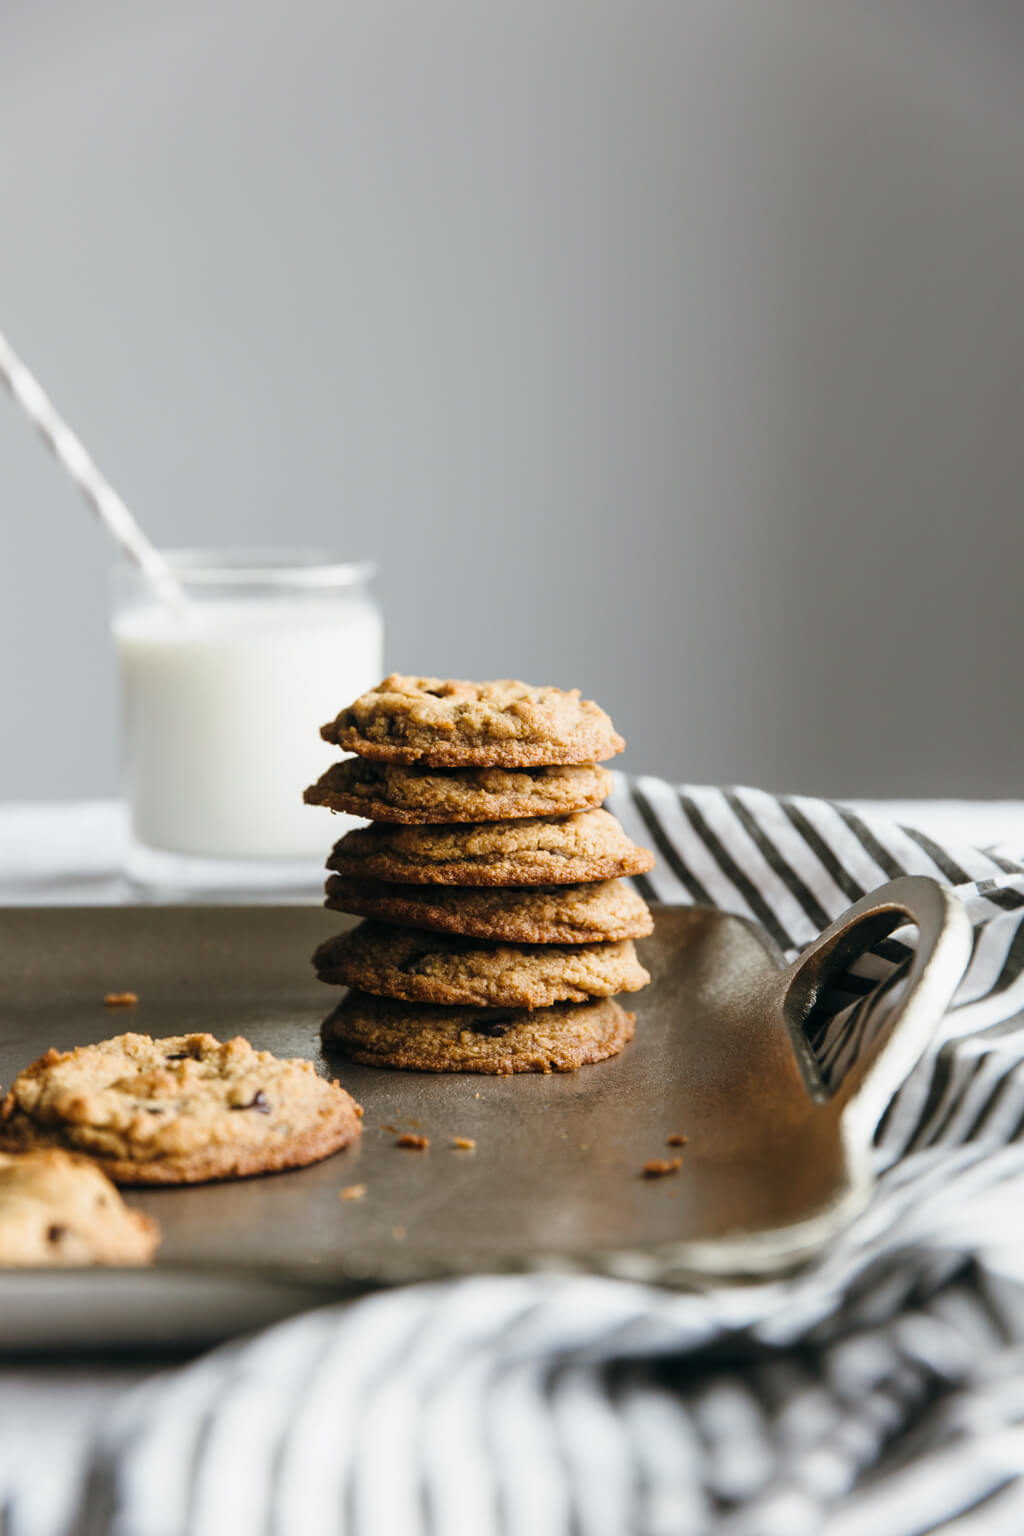 The best chocolate chip cookies. Paleo, vegan, gluten-free, grain-free.